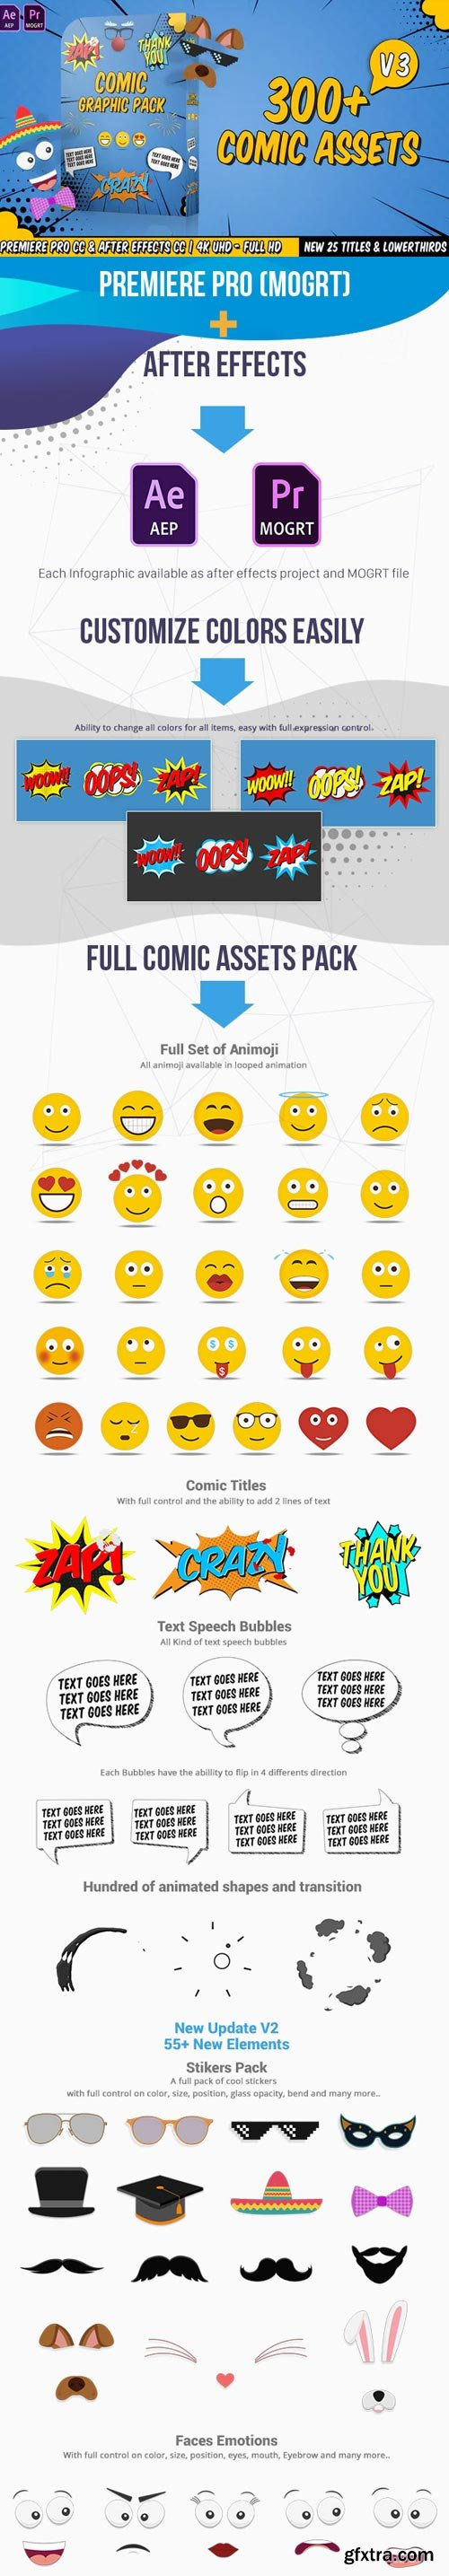 Videohive - Comic Titles - Speech Bubbles - Emoji - Stickers - Flash FX Graphic Pack V.3 - 22645319